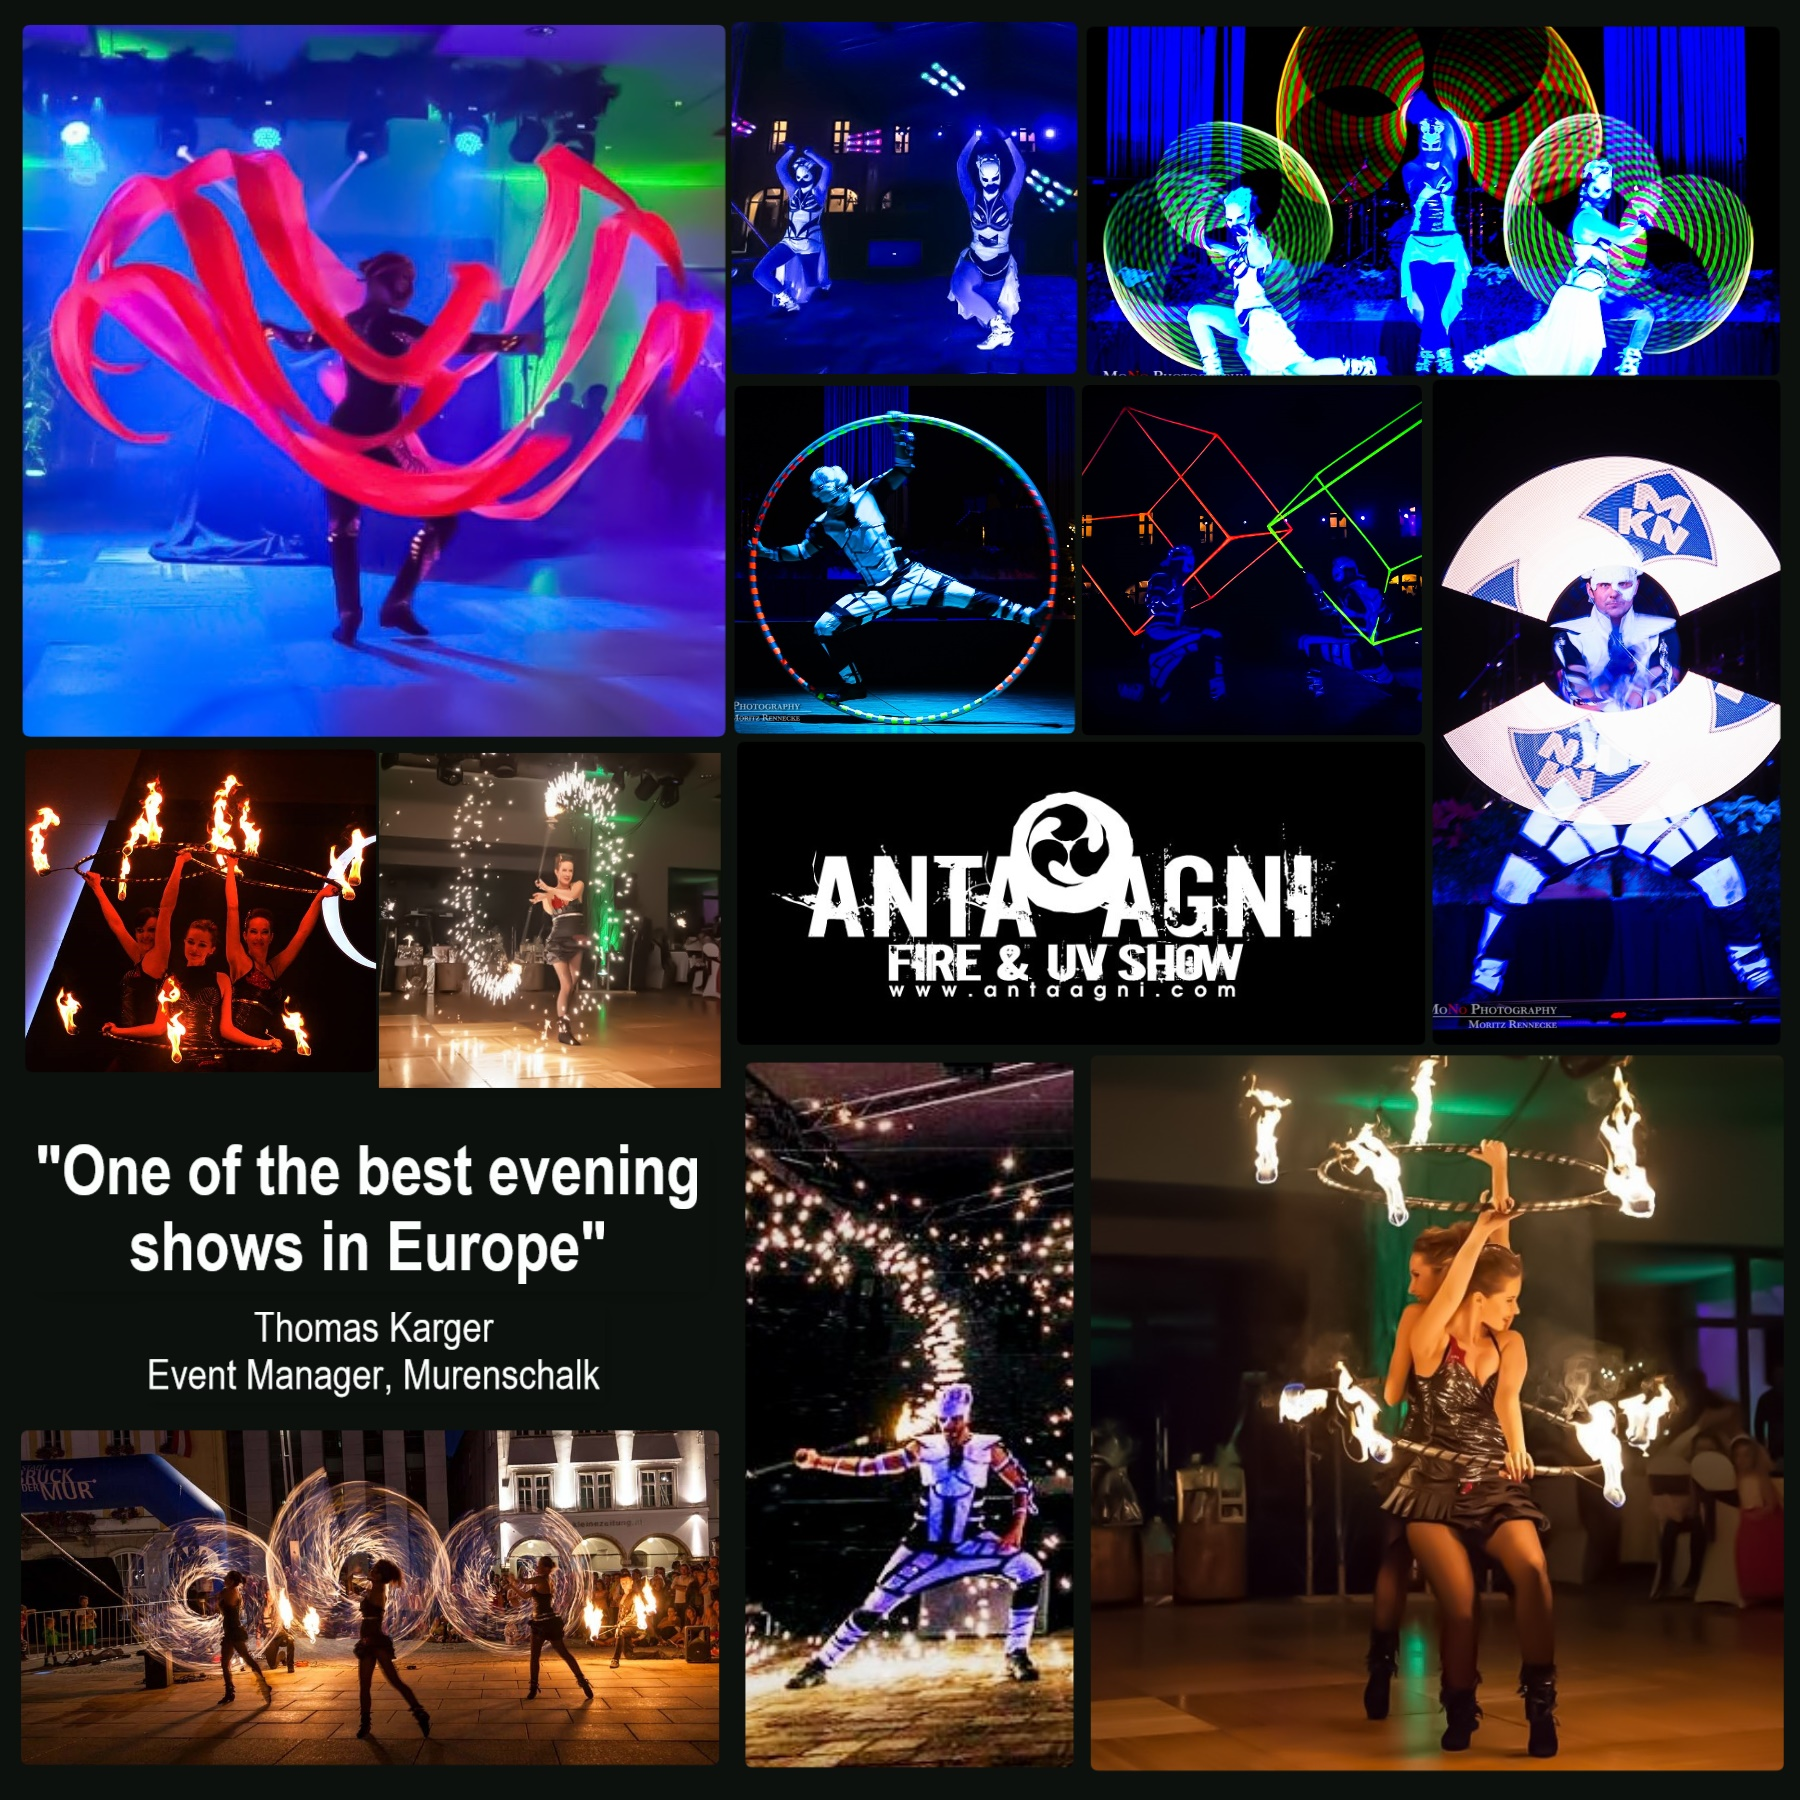 Ďakujeme az podporu Anta Agni - Fire Show a UV Show